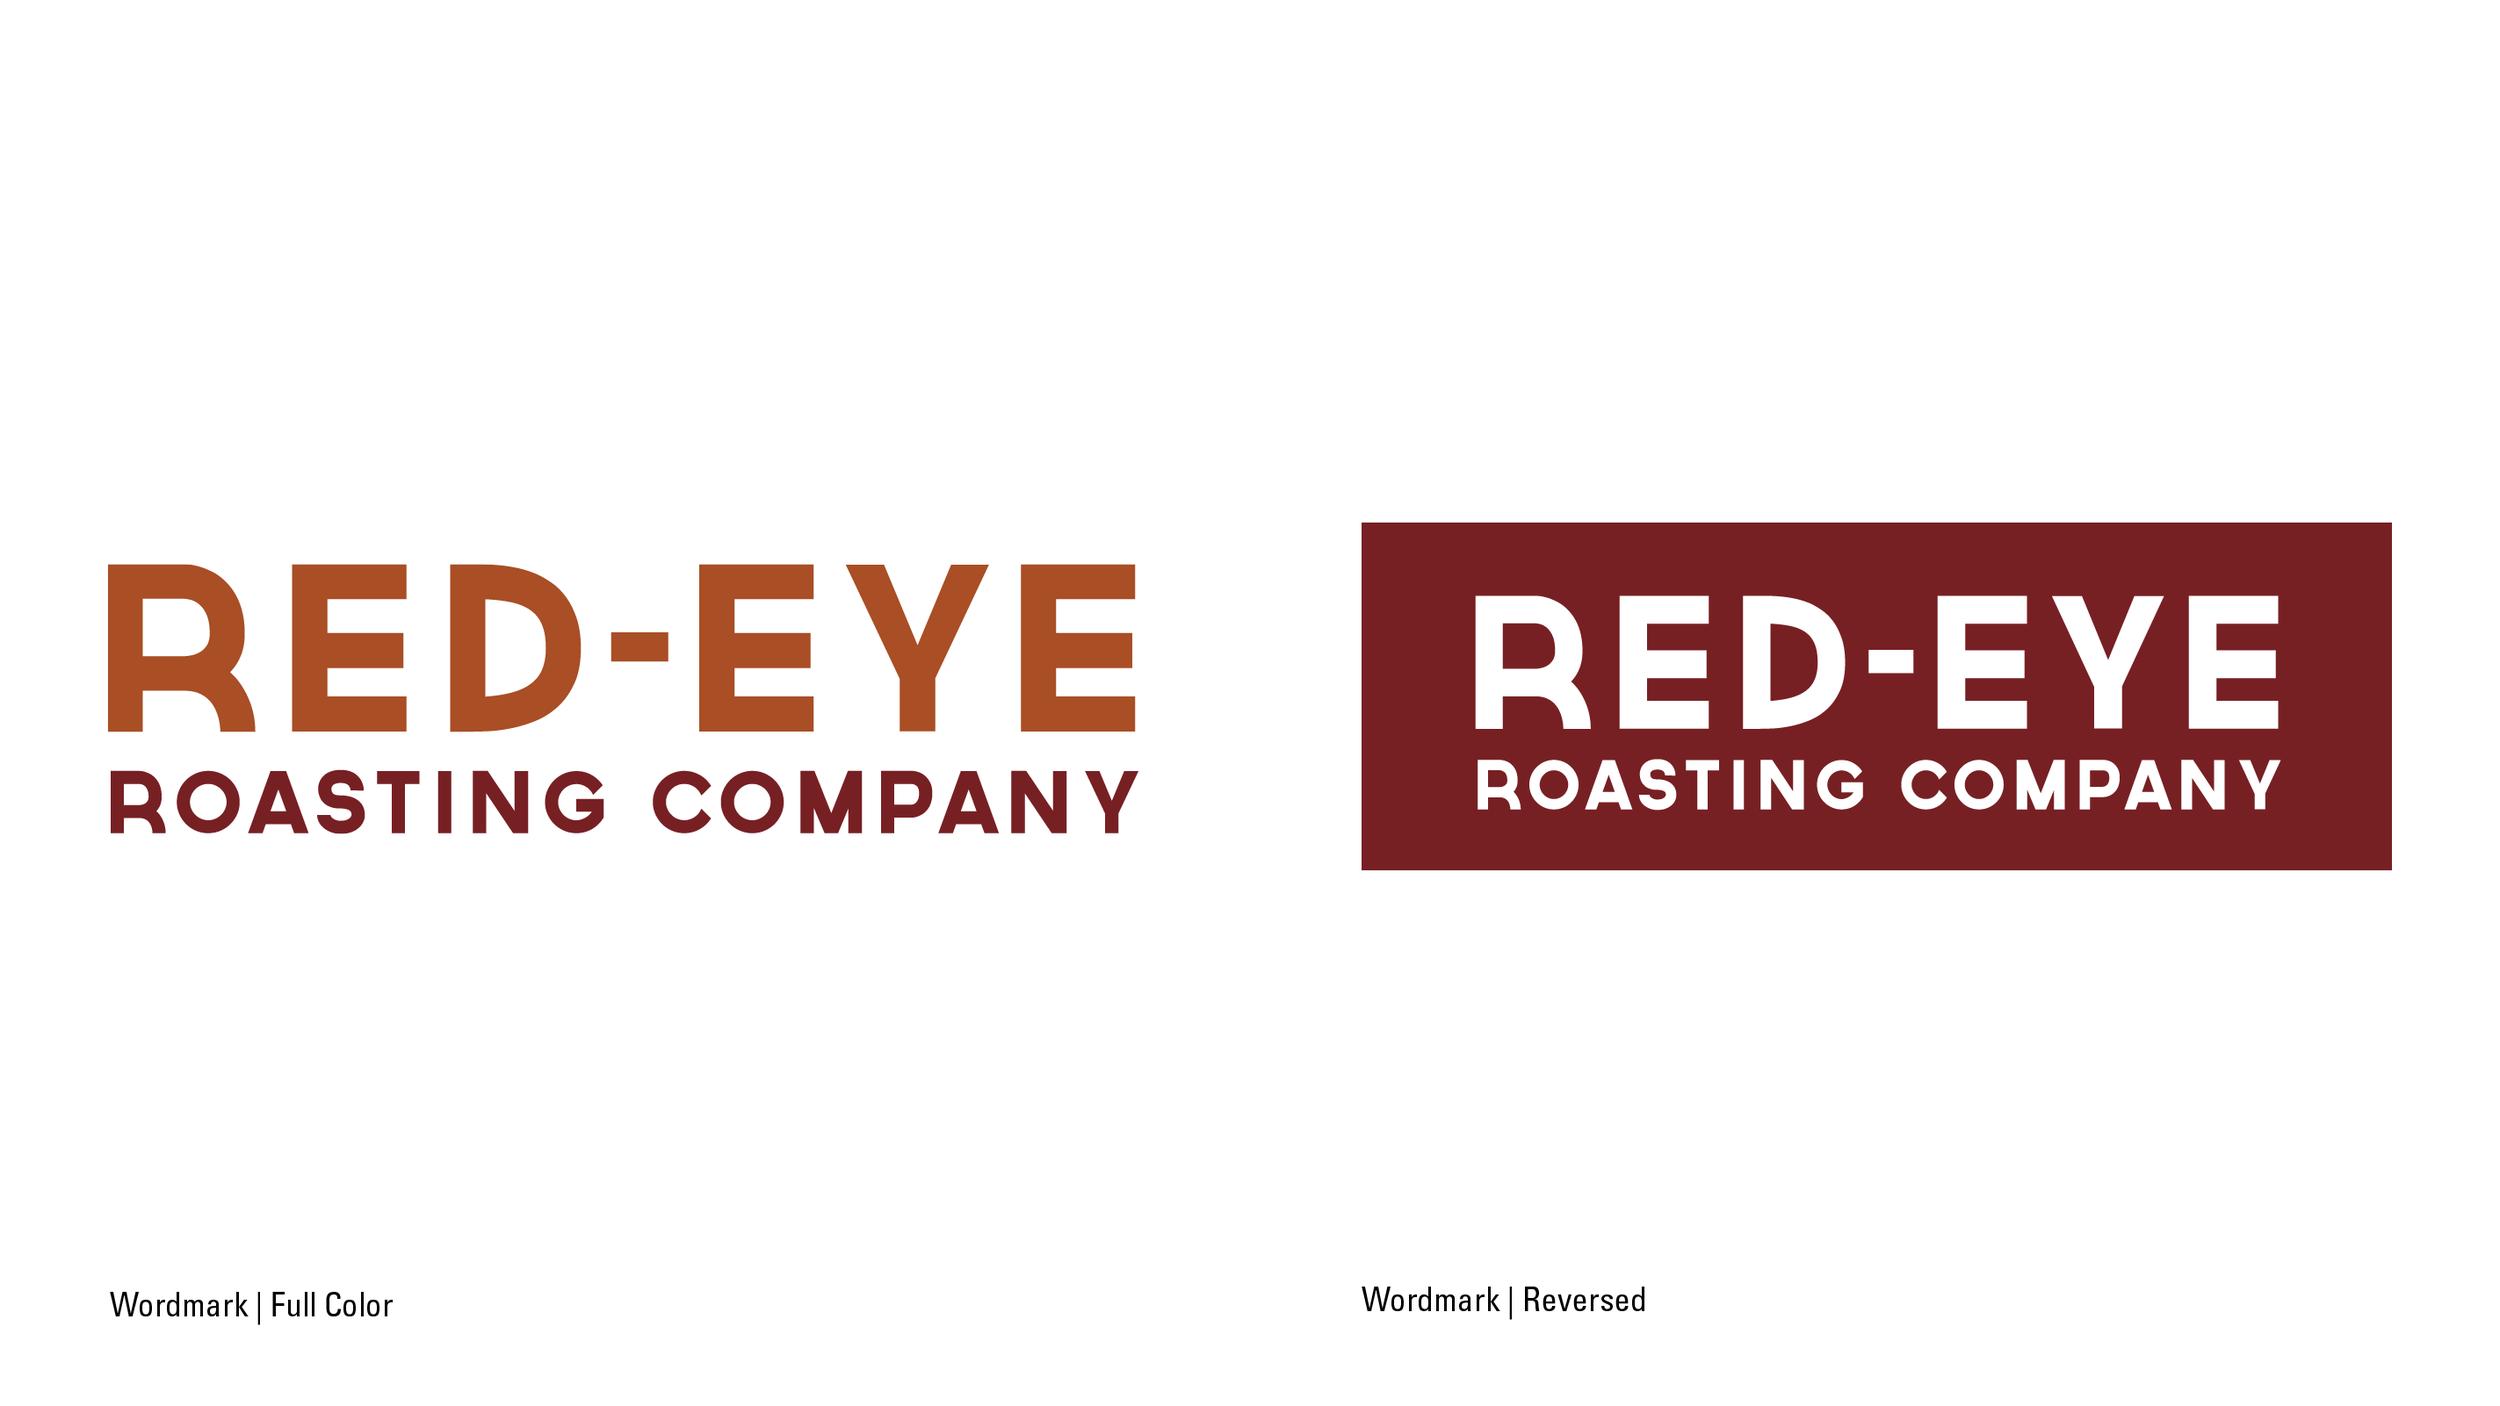 Red-Eye Roasting Company | Branding — KW